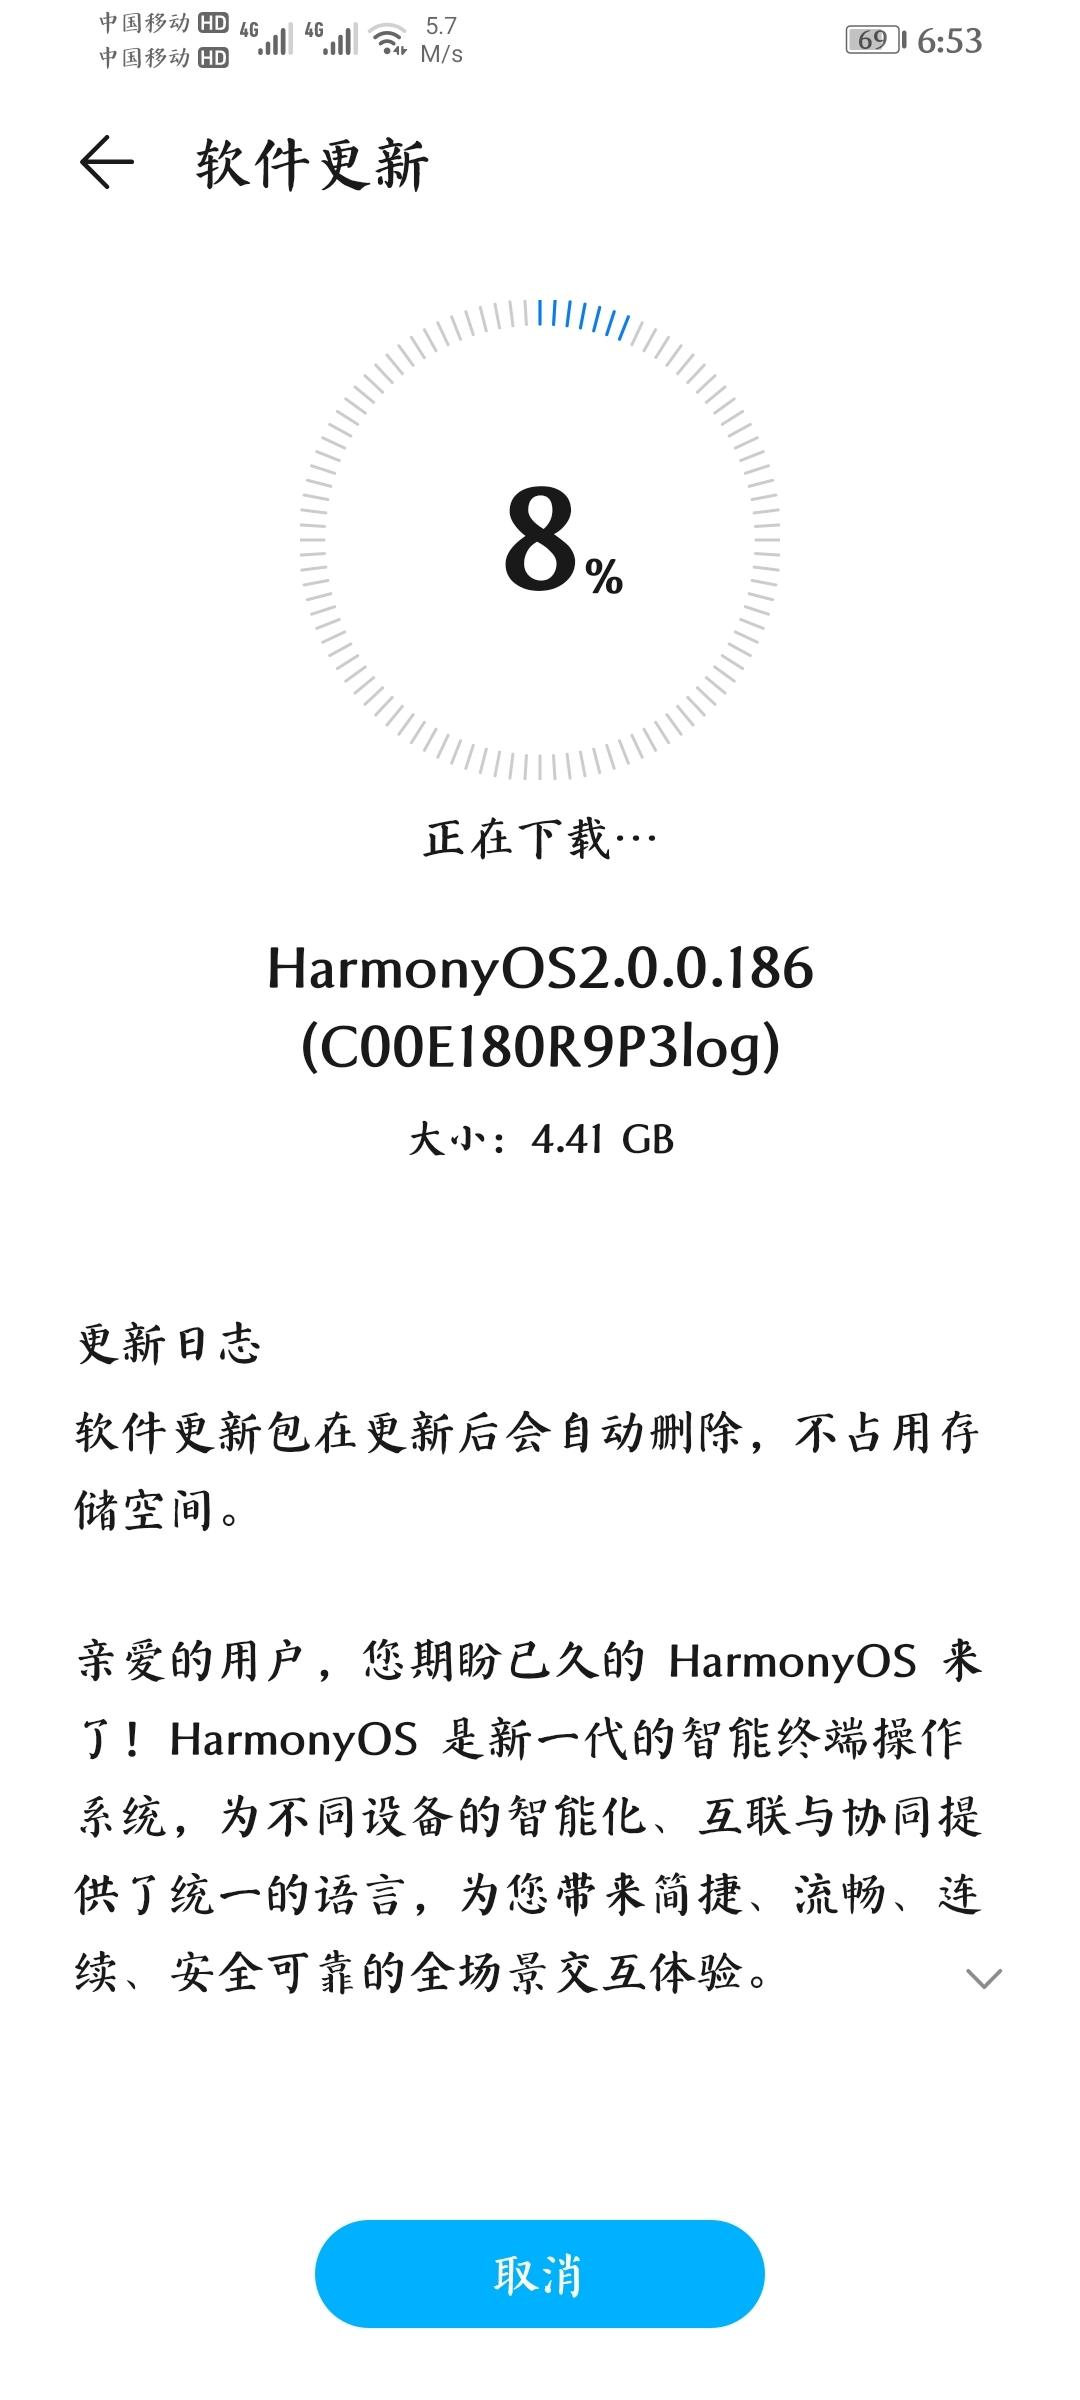 Screenshot_20210915_185302_com.huawei.android.hwouc.jpg